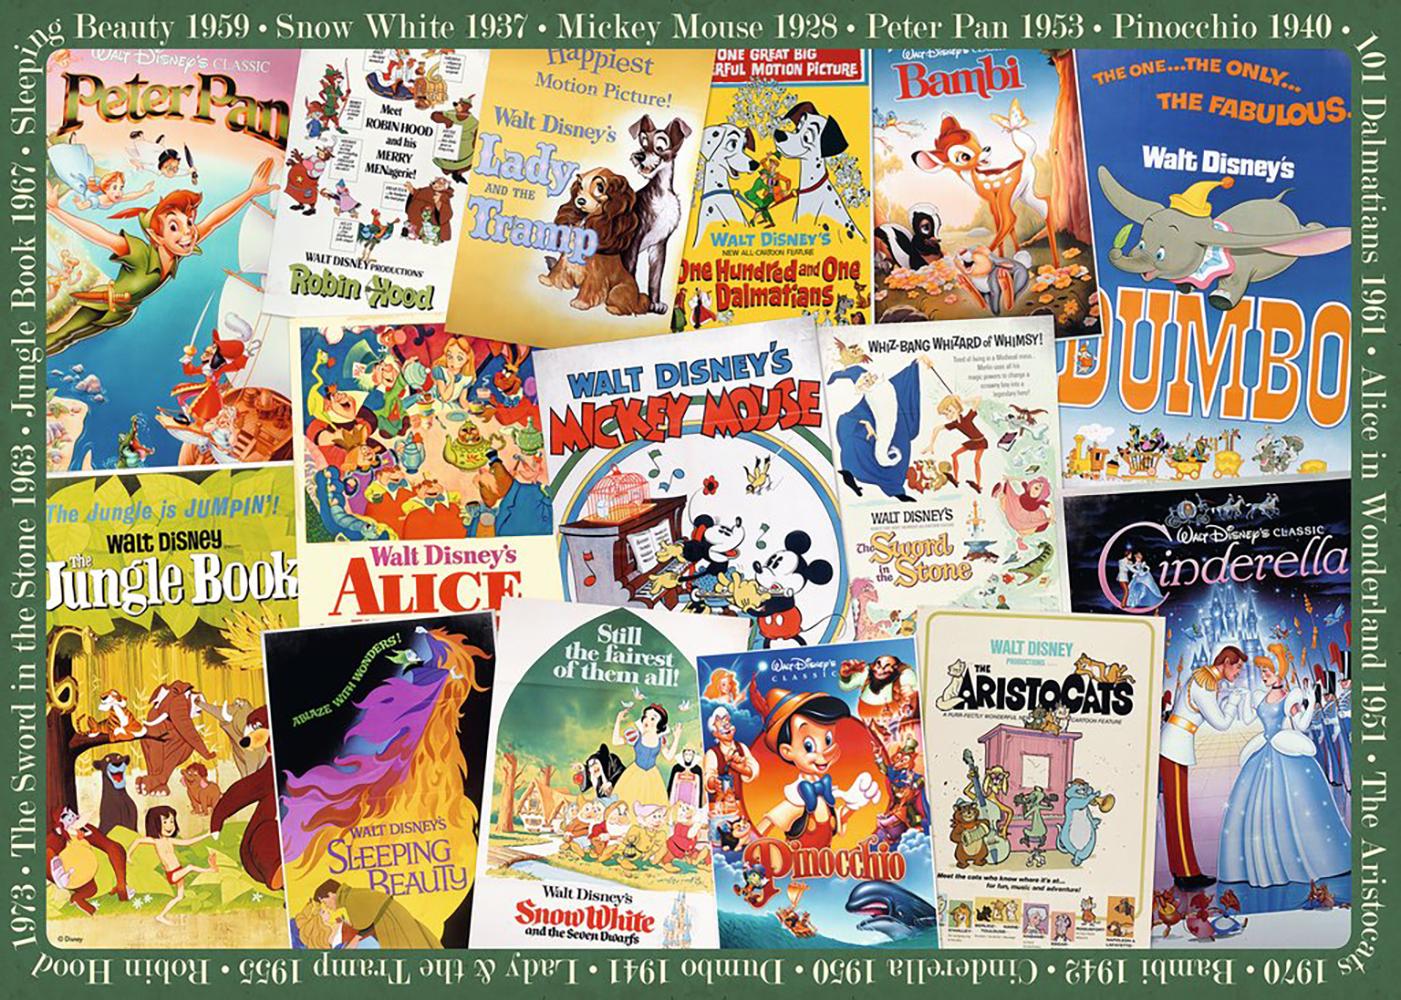 Casse-tête 1000 pcs - Poster Vintage Disney